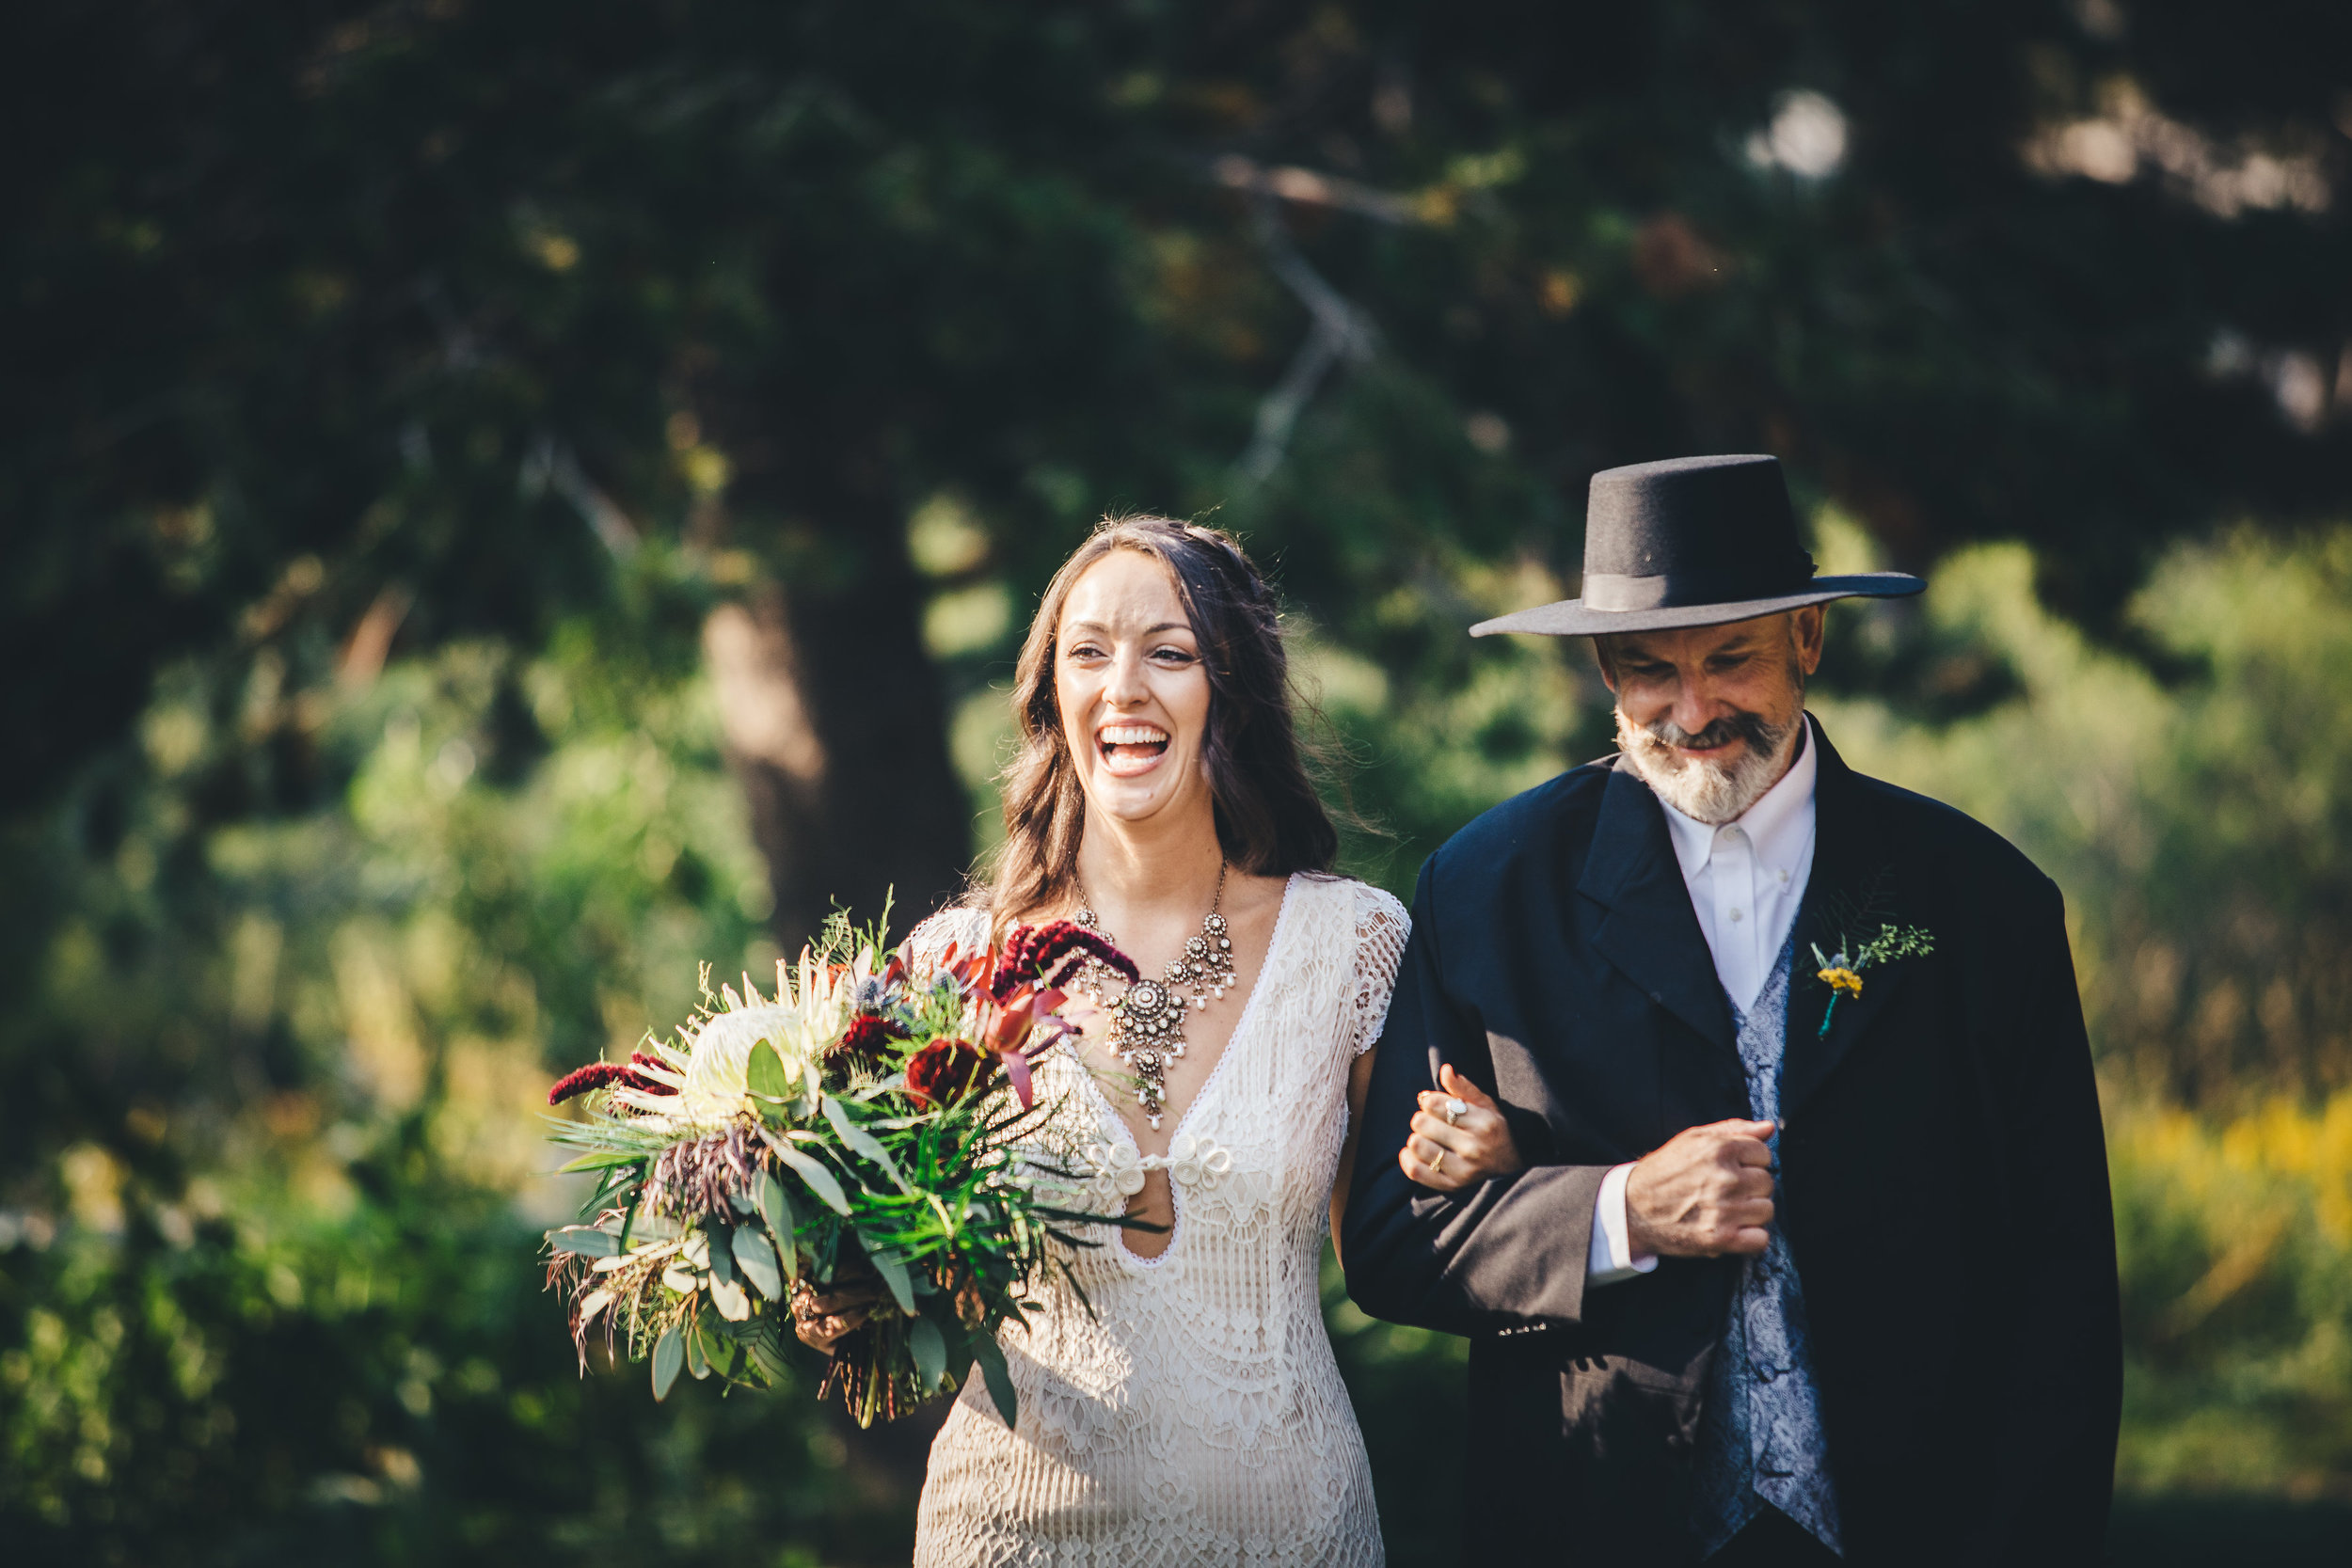 bridal bouquet tahoe wedding bloom generation